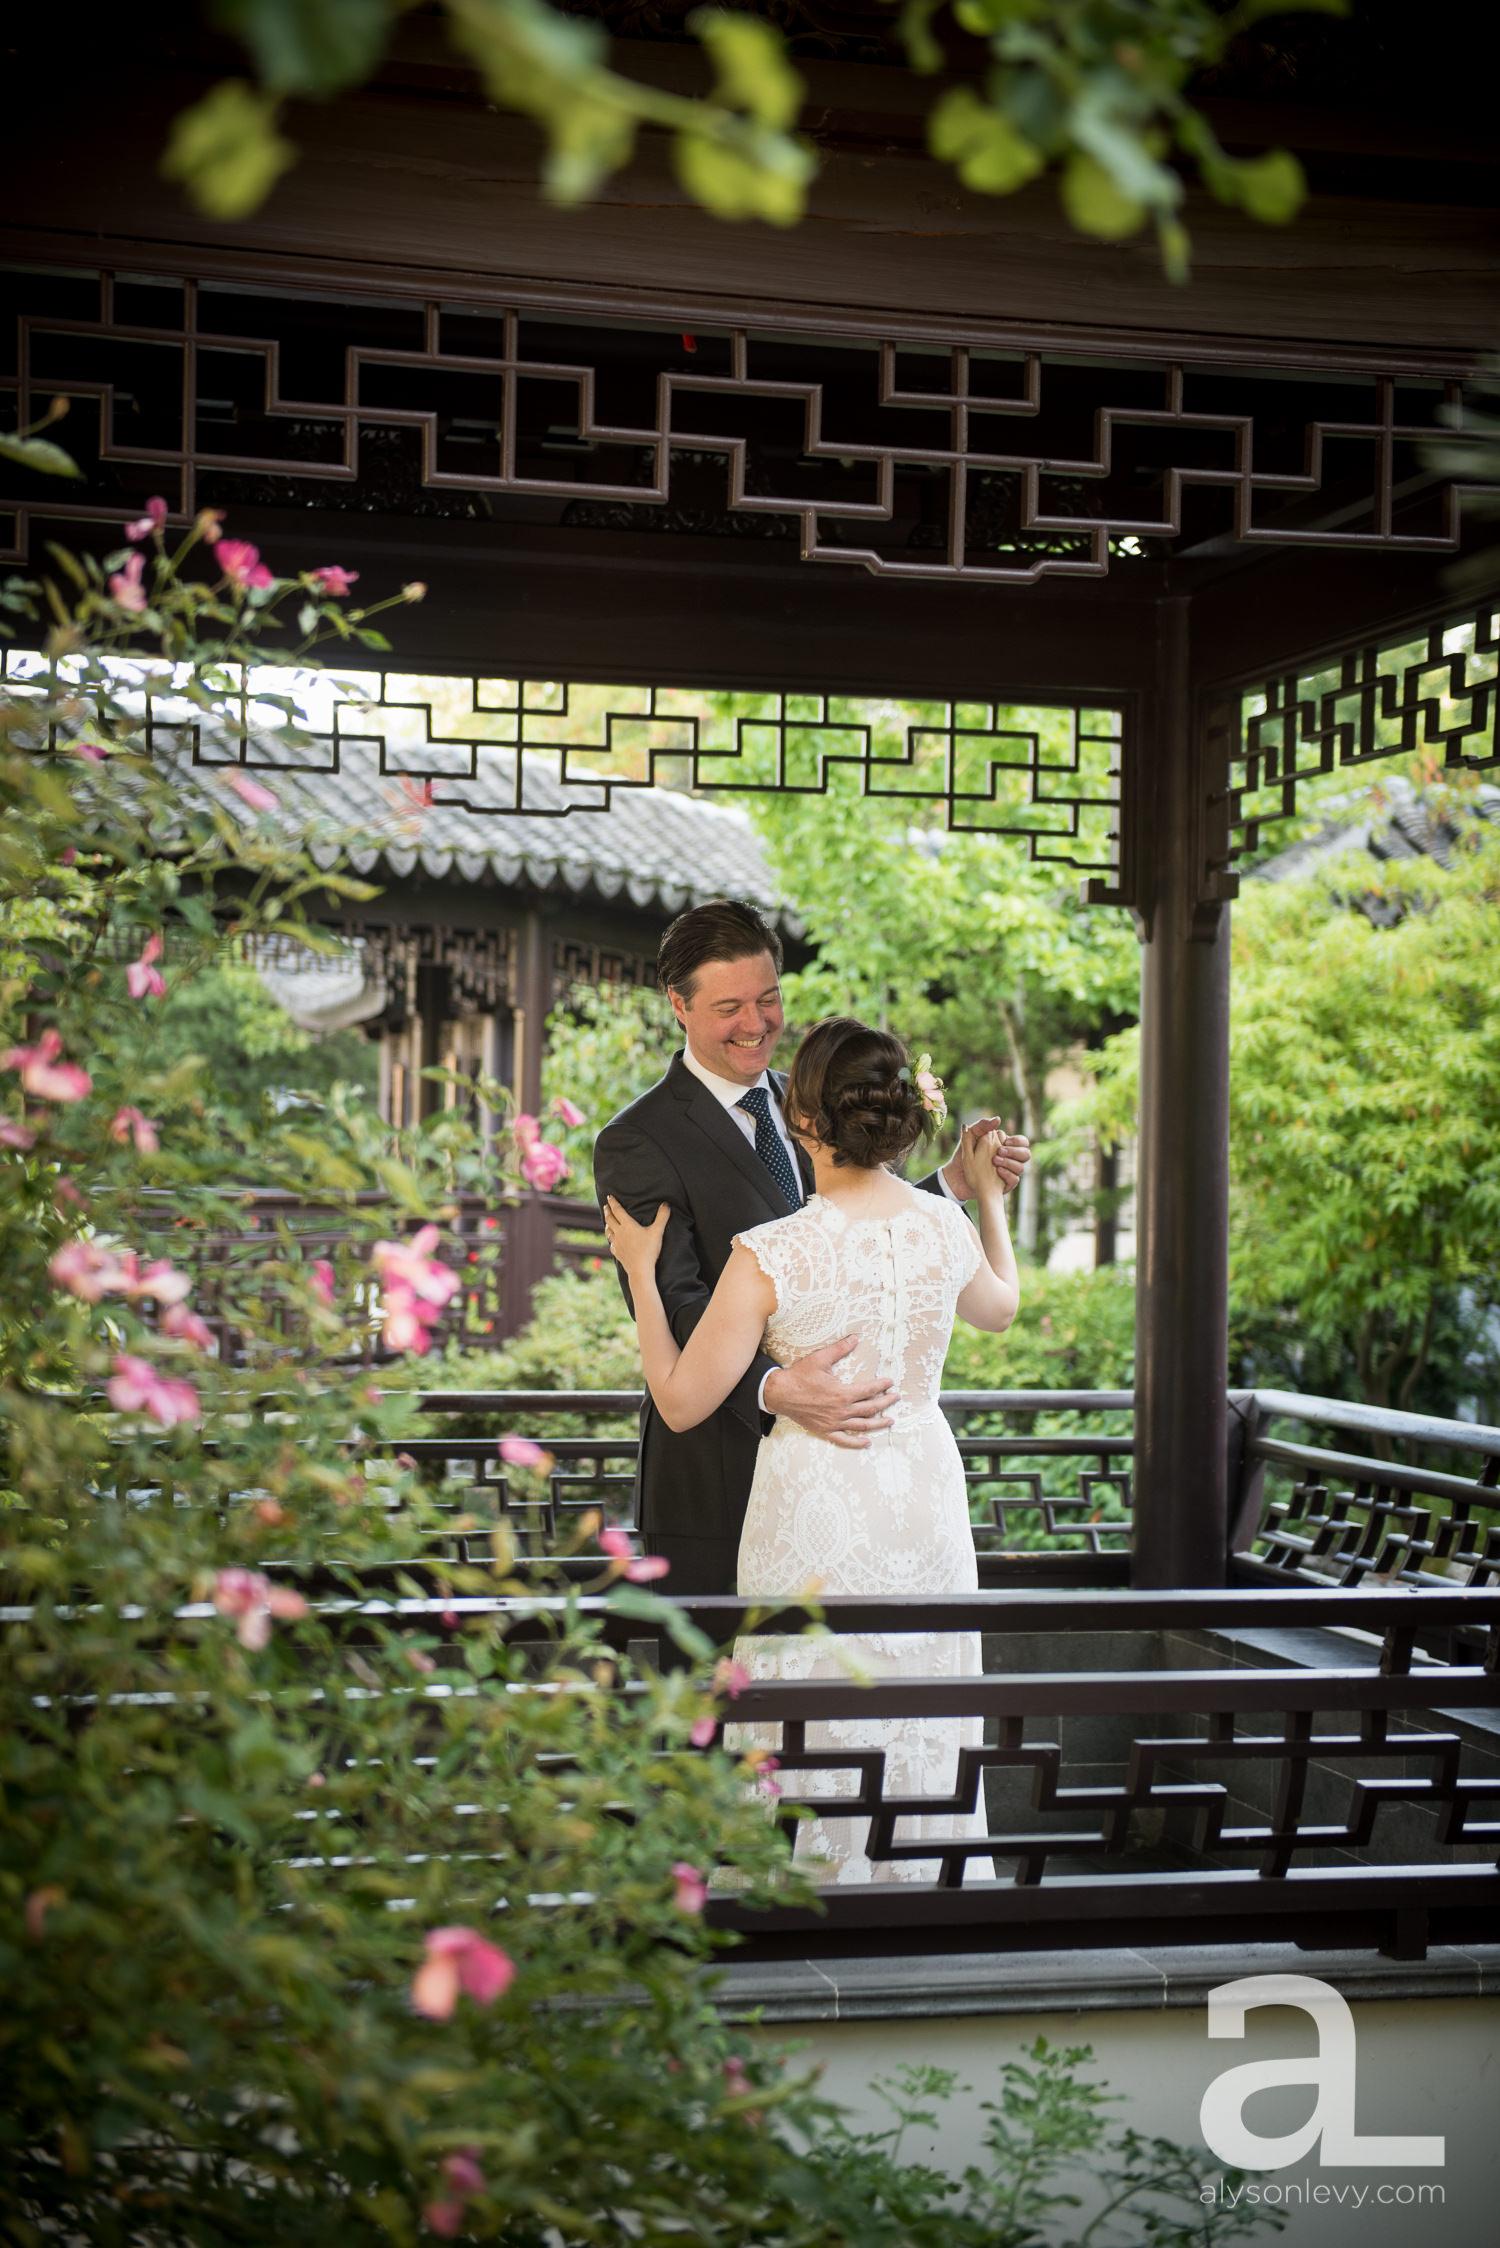 Lan-Su-Portland-Wedding-Photography-004.jpg